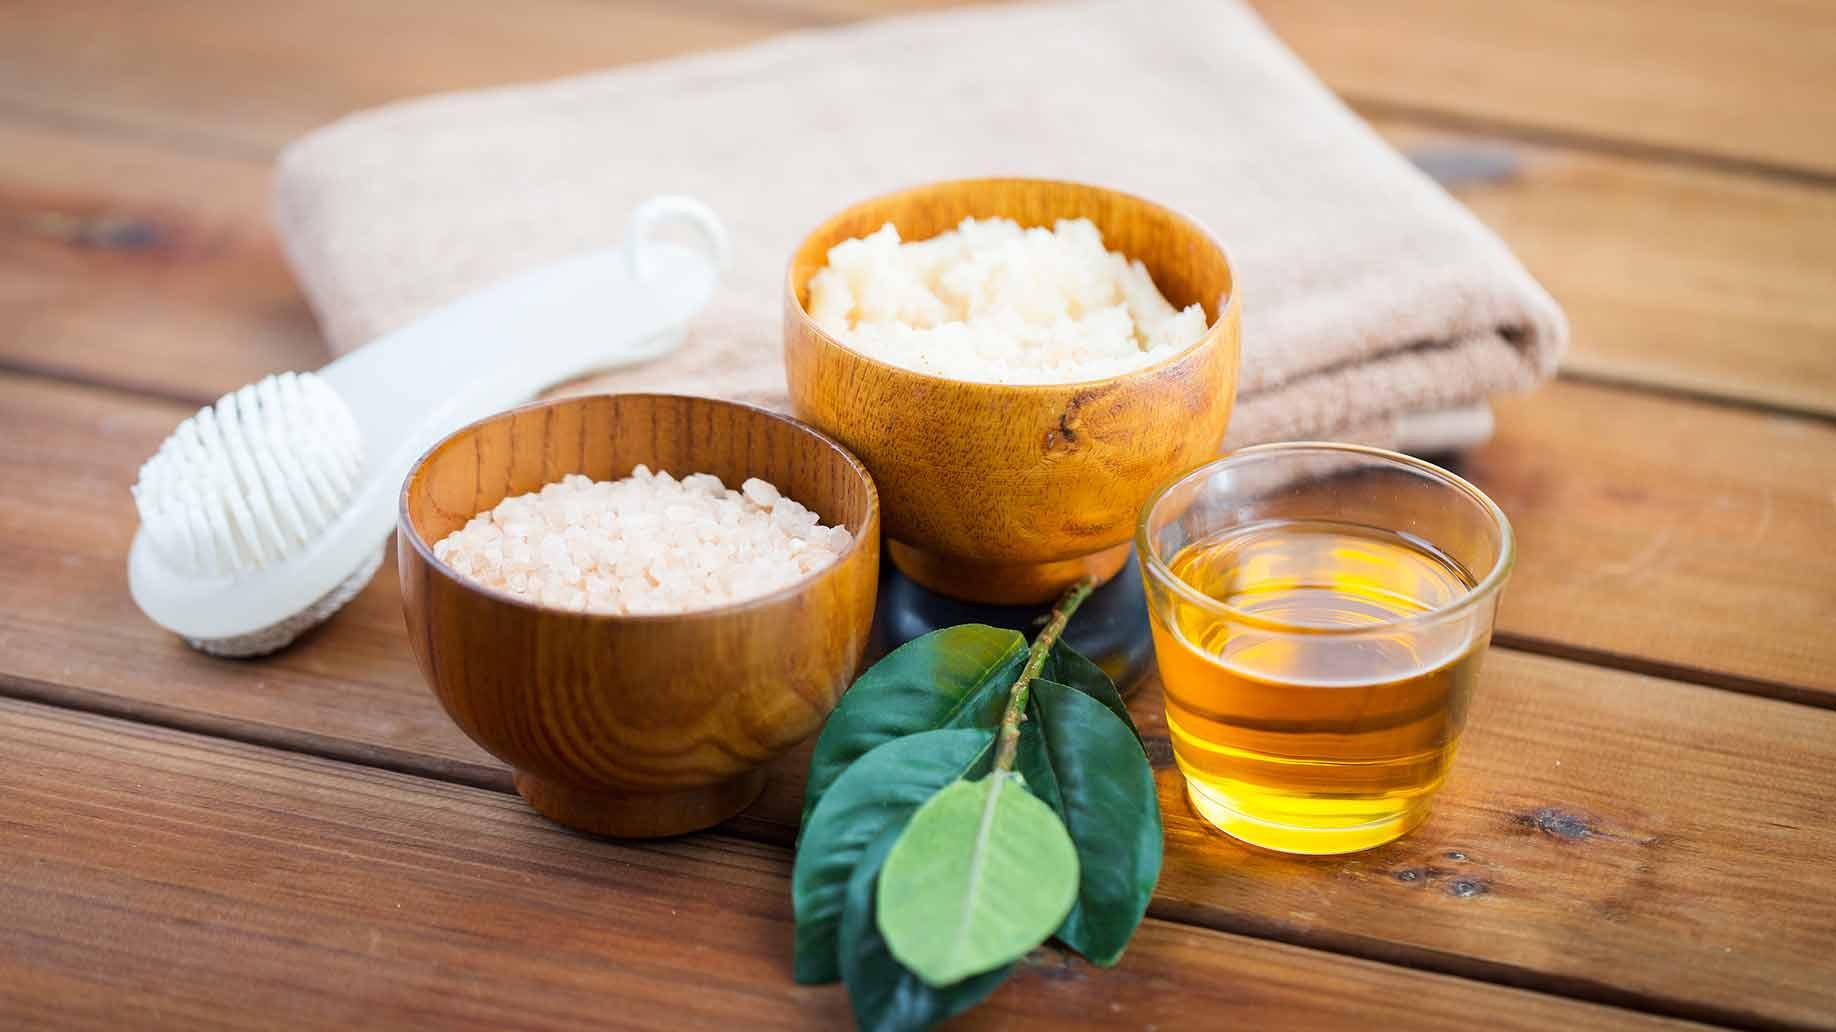 detox-bath-salts-apple-cider-vinegar-baking-soda.jpg